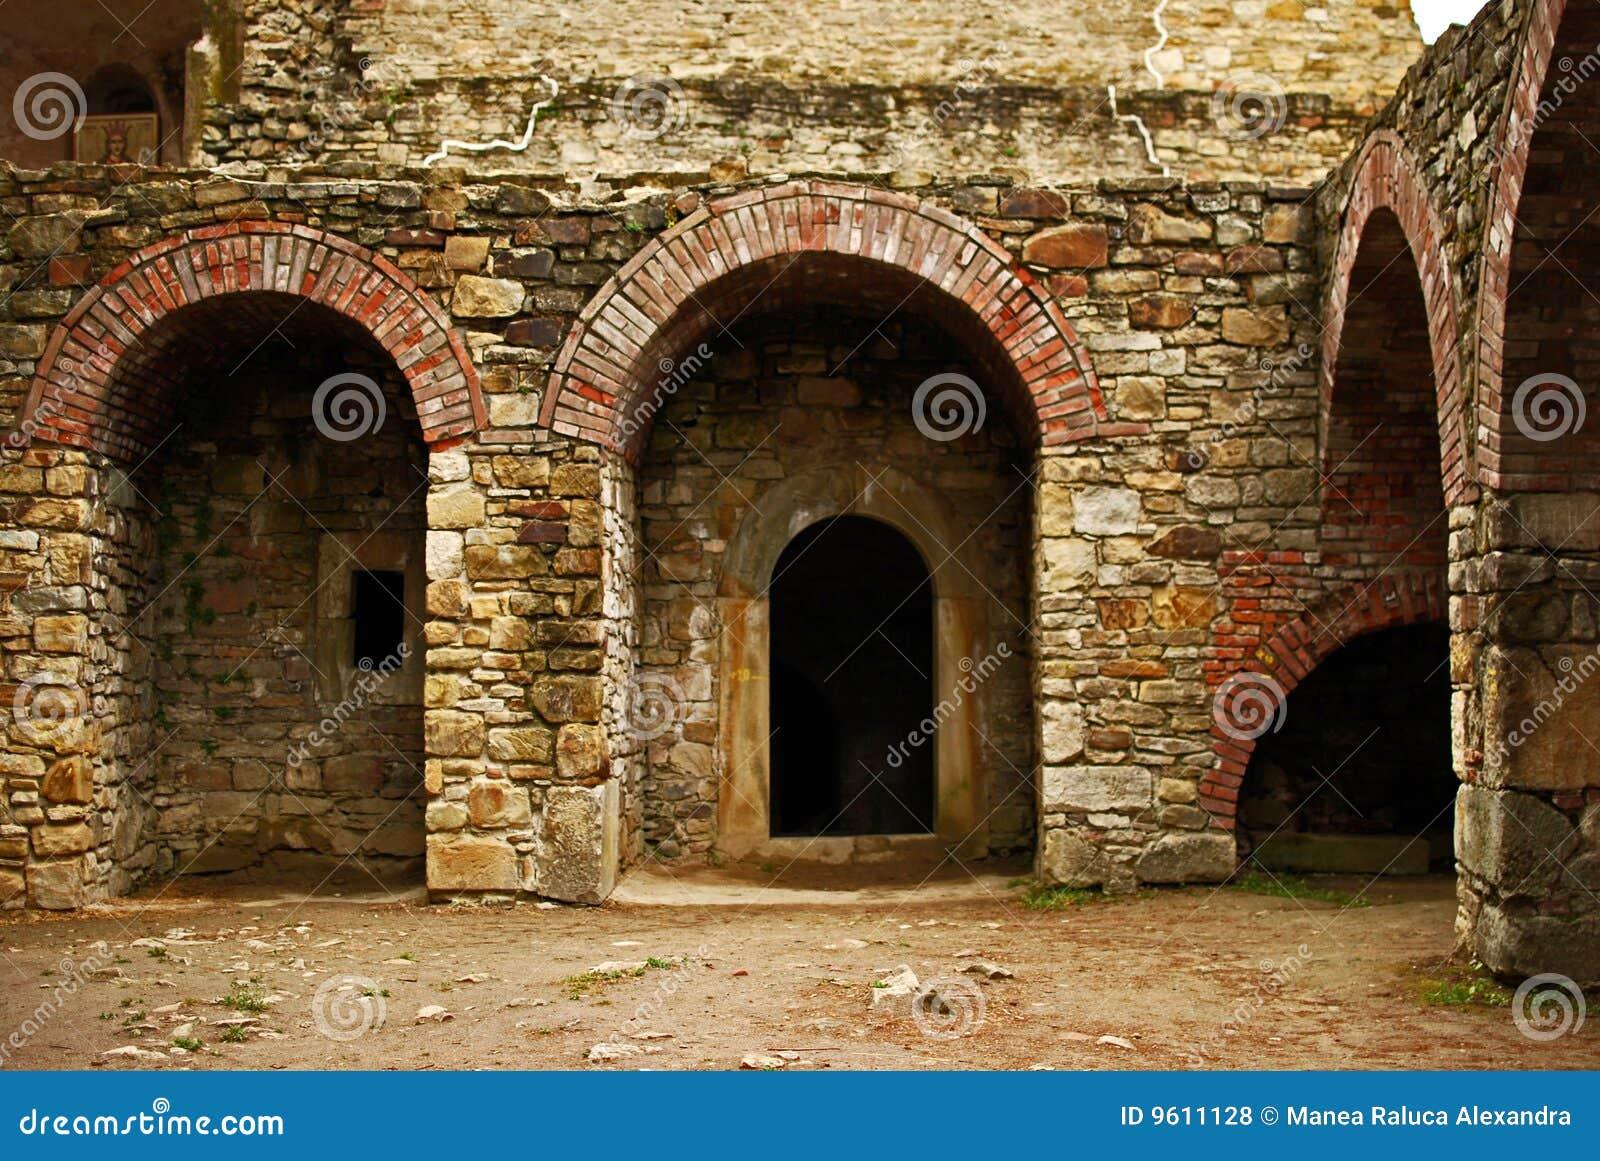 Suceava s fortress ruins